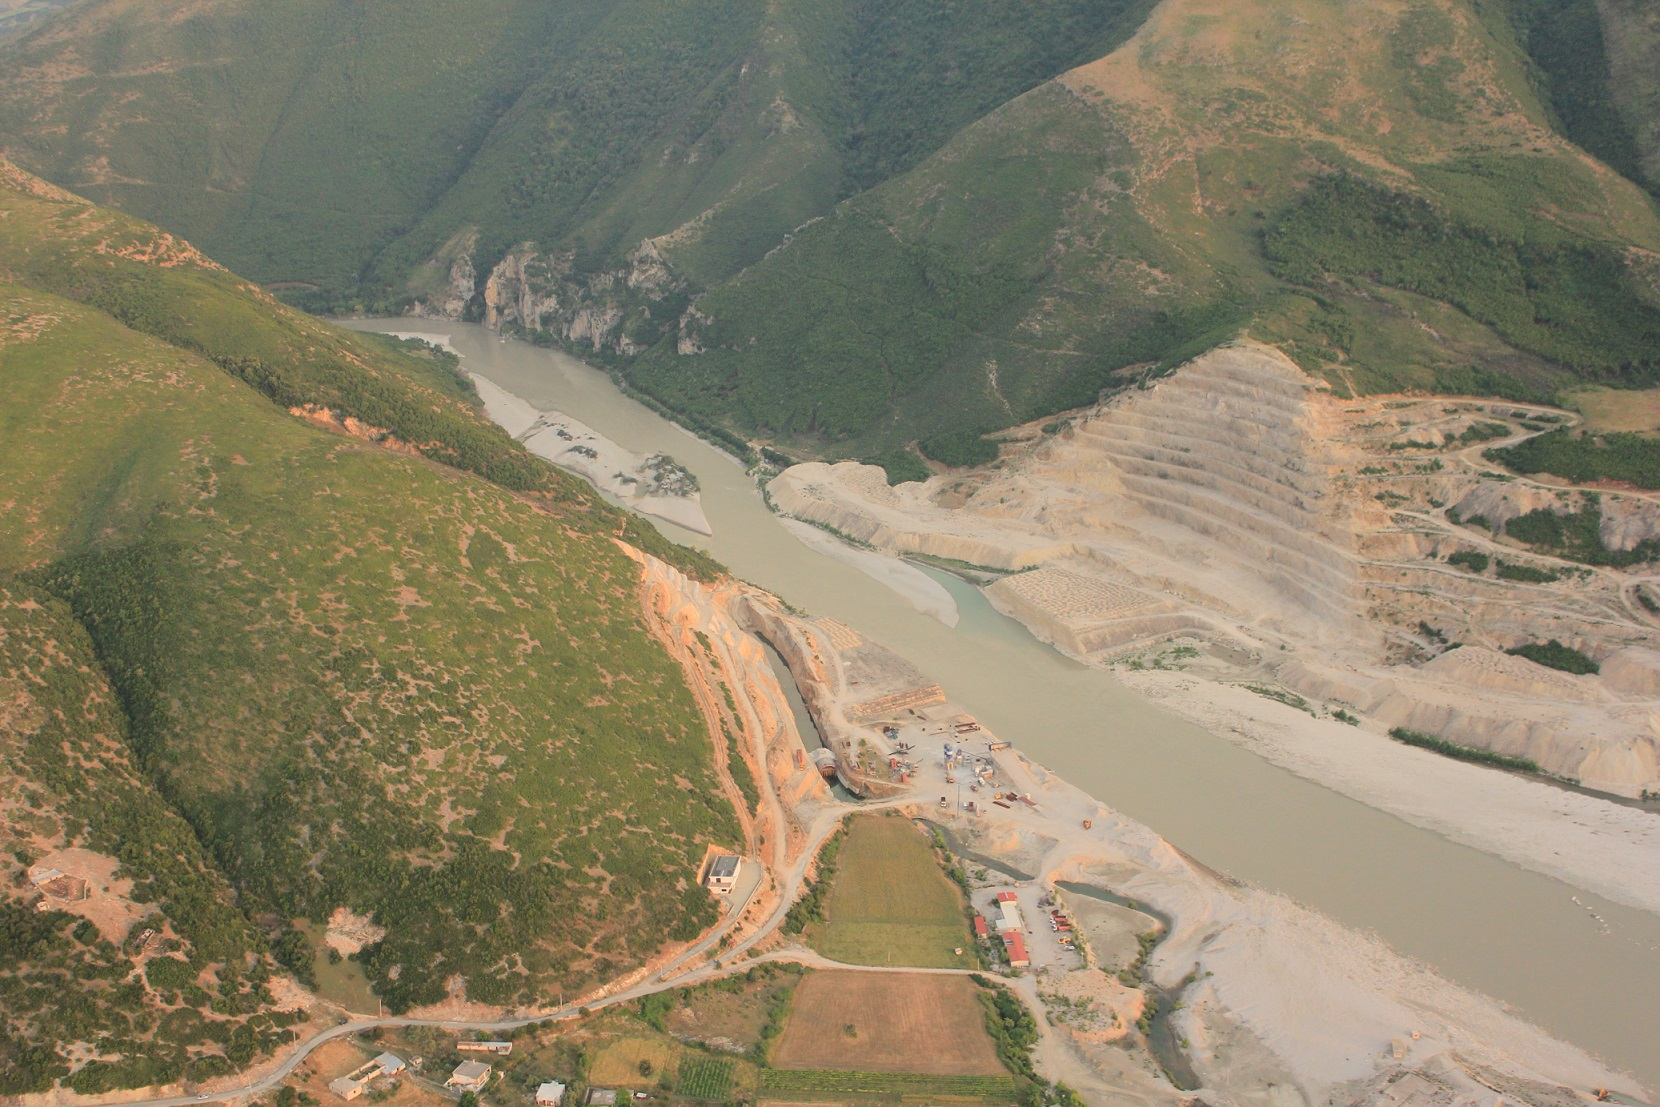 The unfinished Kalivaç dam. Now, a new concession shall revive its construction. © Roland Dorozhani